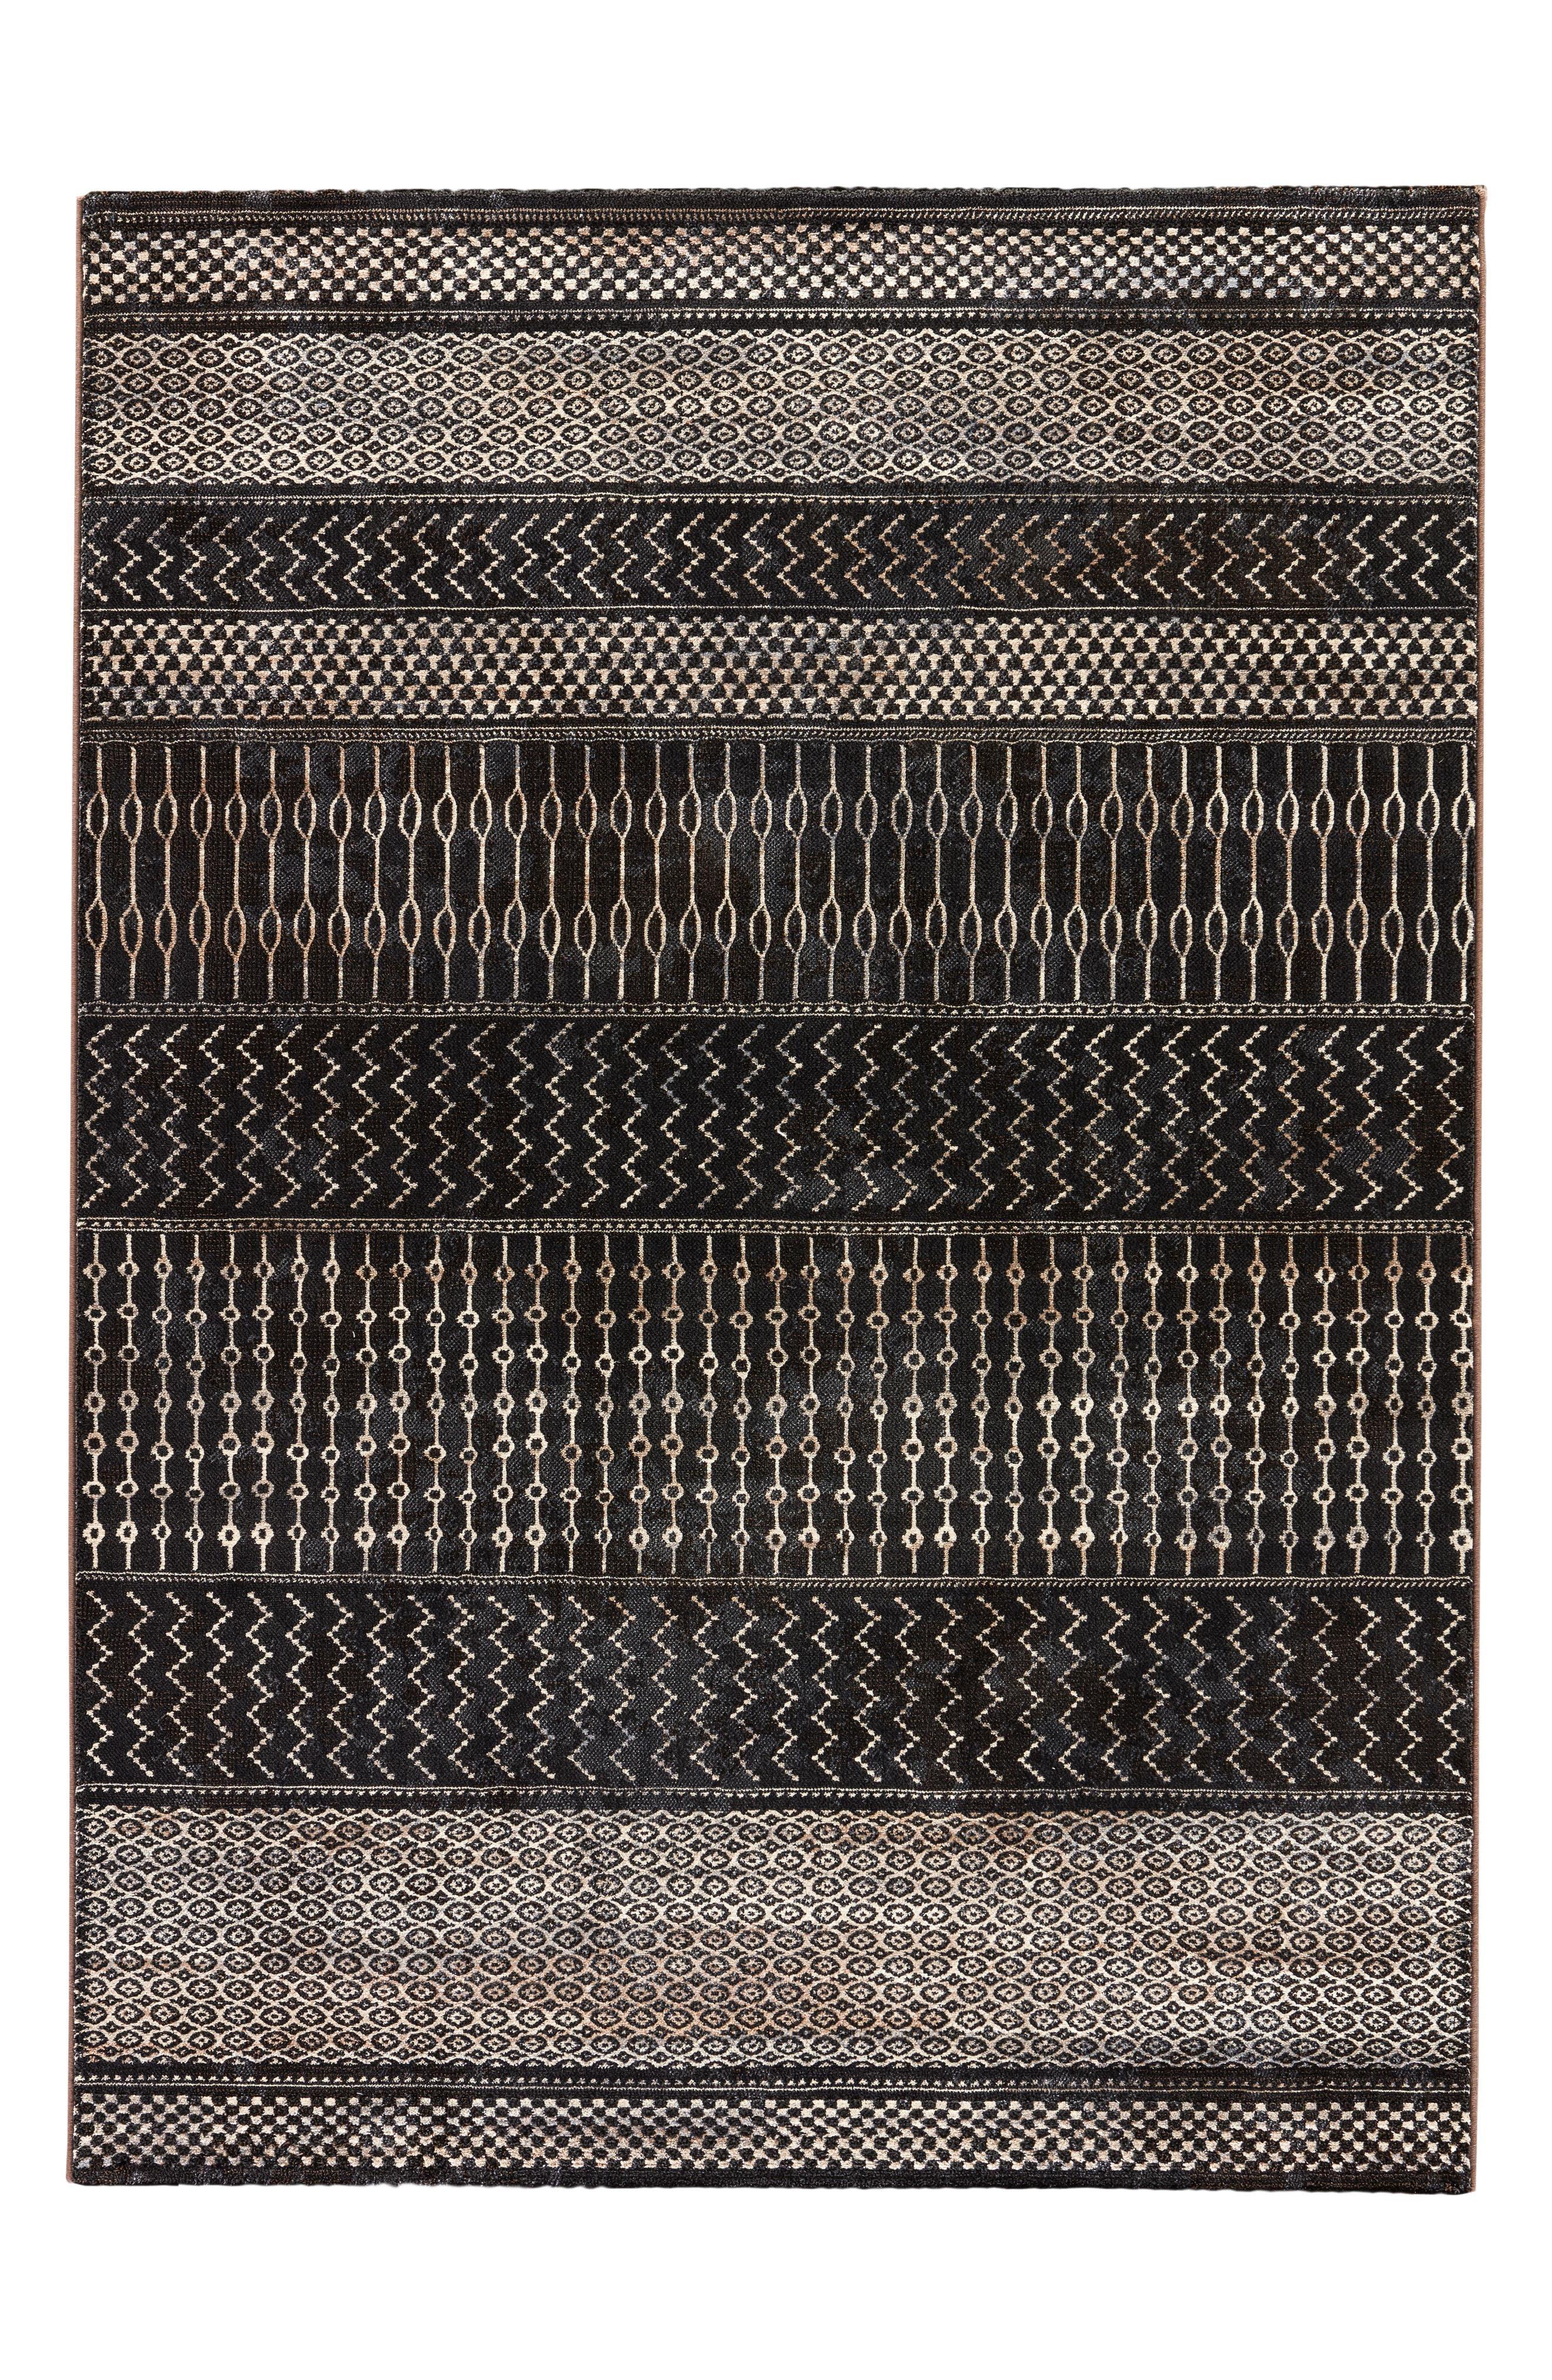 Contemporary Loft Rug,                         Main,                         color, Black